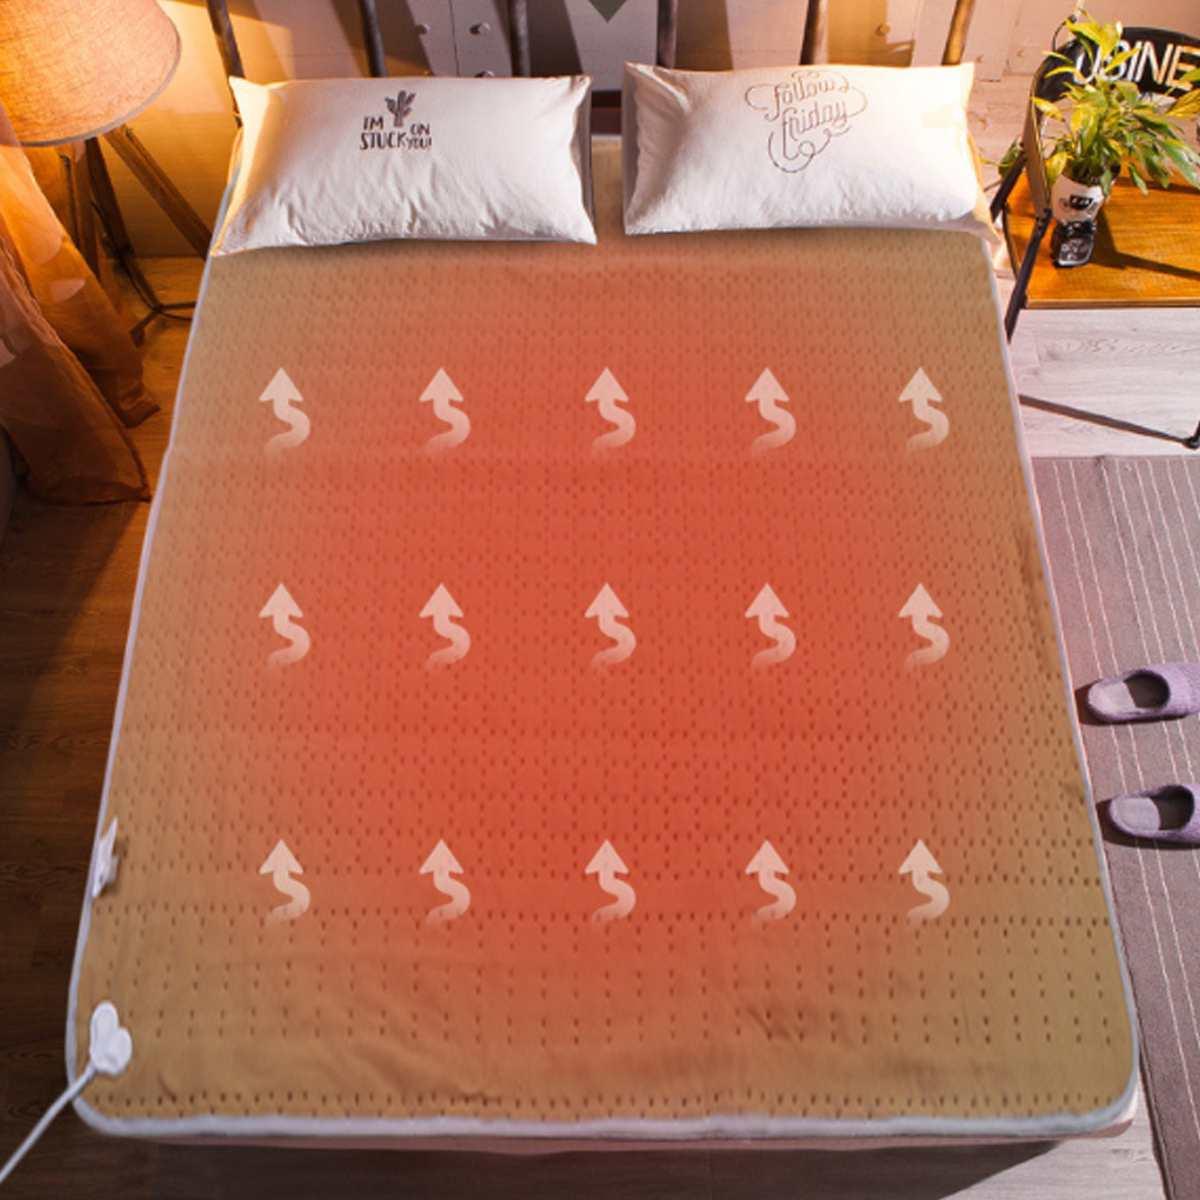 Electric Blanket Mat 220V Auto Electric Heated Blanket Mat Waterproof Heating Carpet 4 Gears Electric Heater Mattress